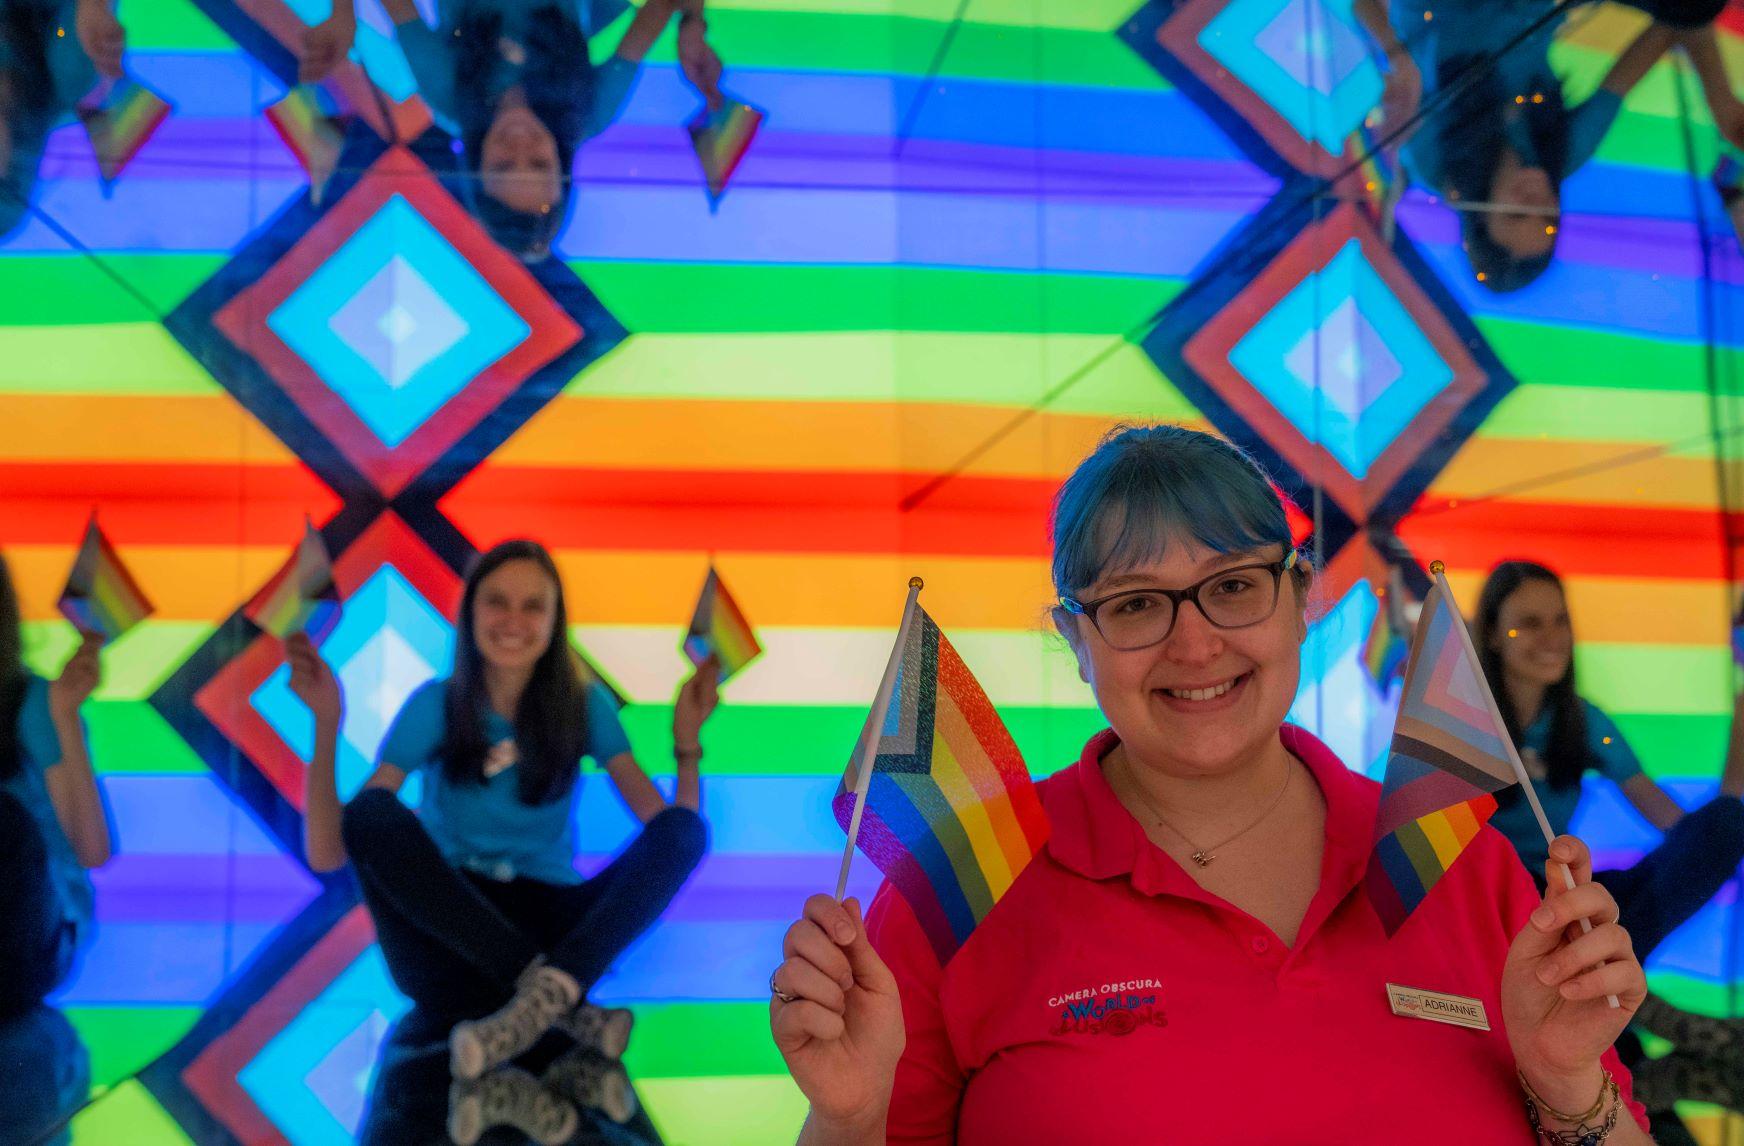 Lisa and Adrianne celebrate Pride Month in the Giant Kaleidosphere June 2021